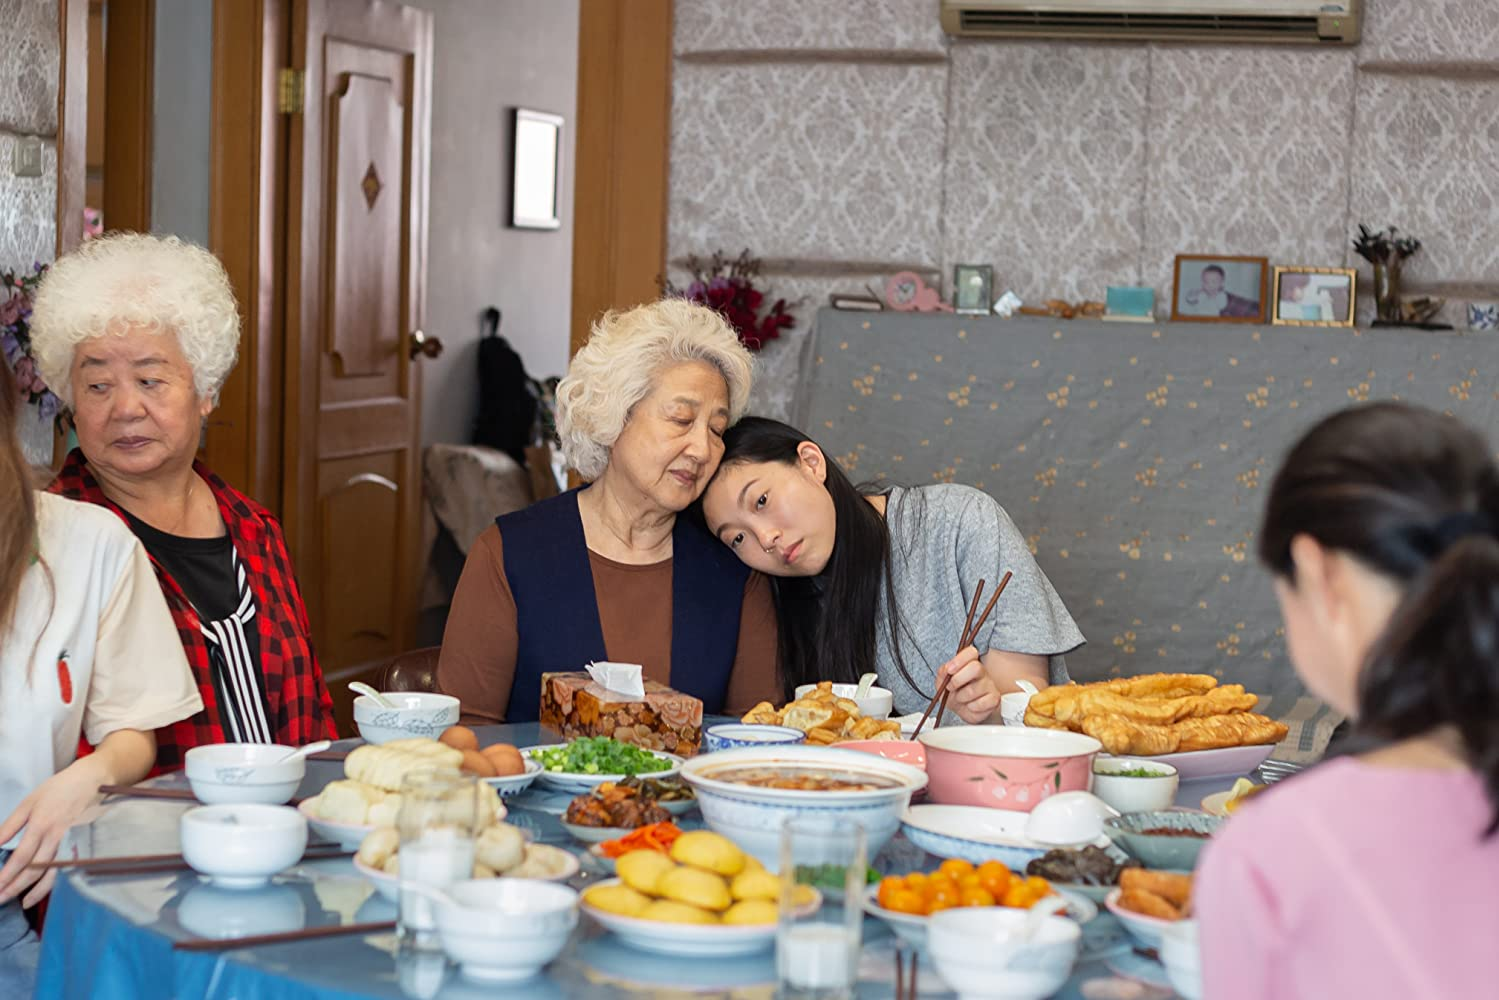 Shuzhen Zhao, Hong Lu, and Awkwafina in The Farewell (2019)